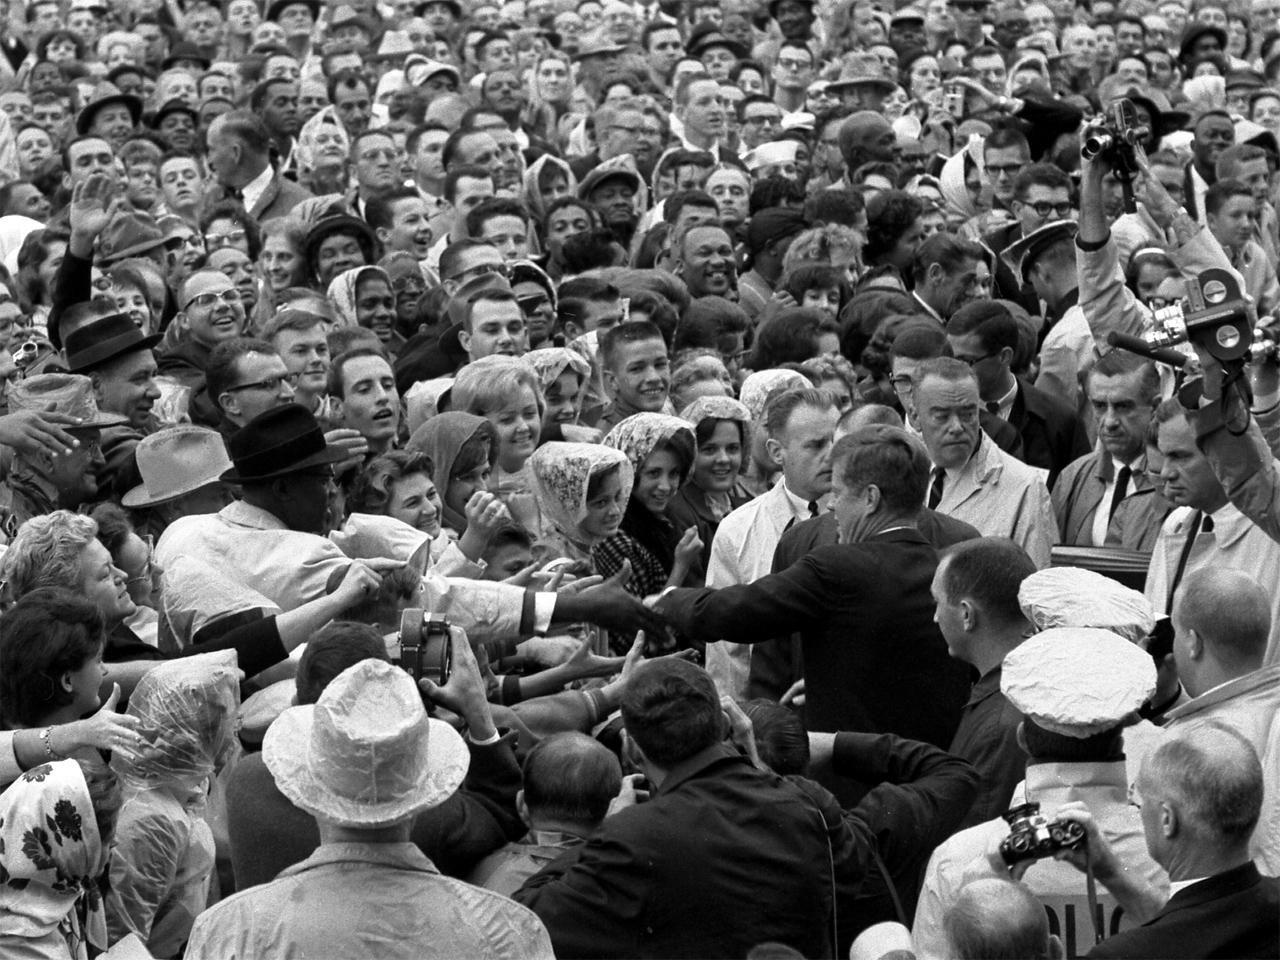 Livestream of CBS' 1963 coverage of JFK assassination - CBS News